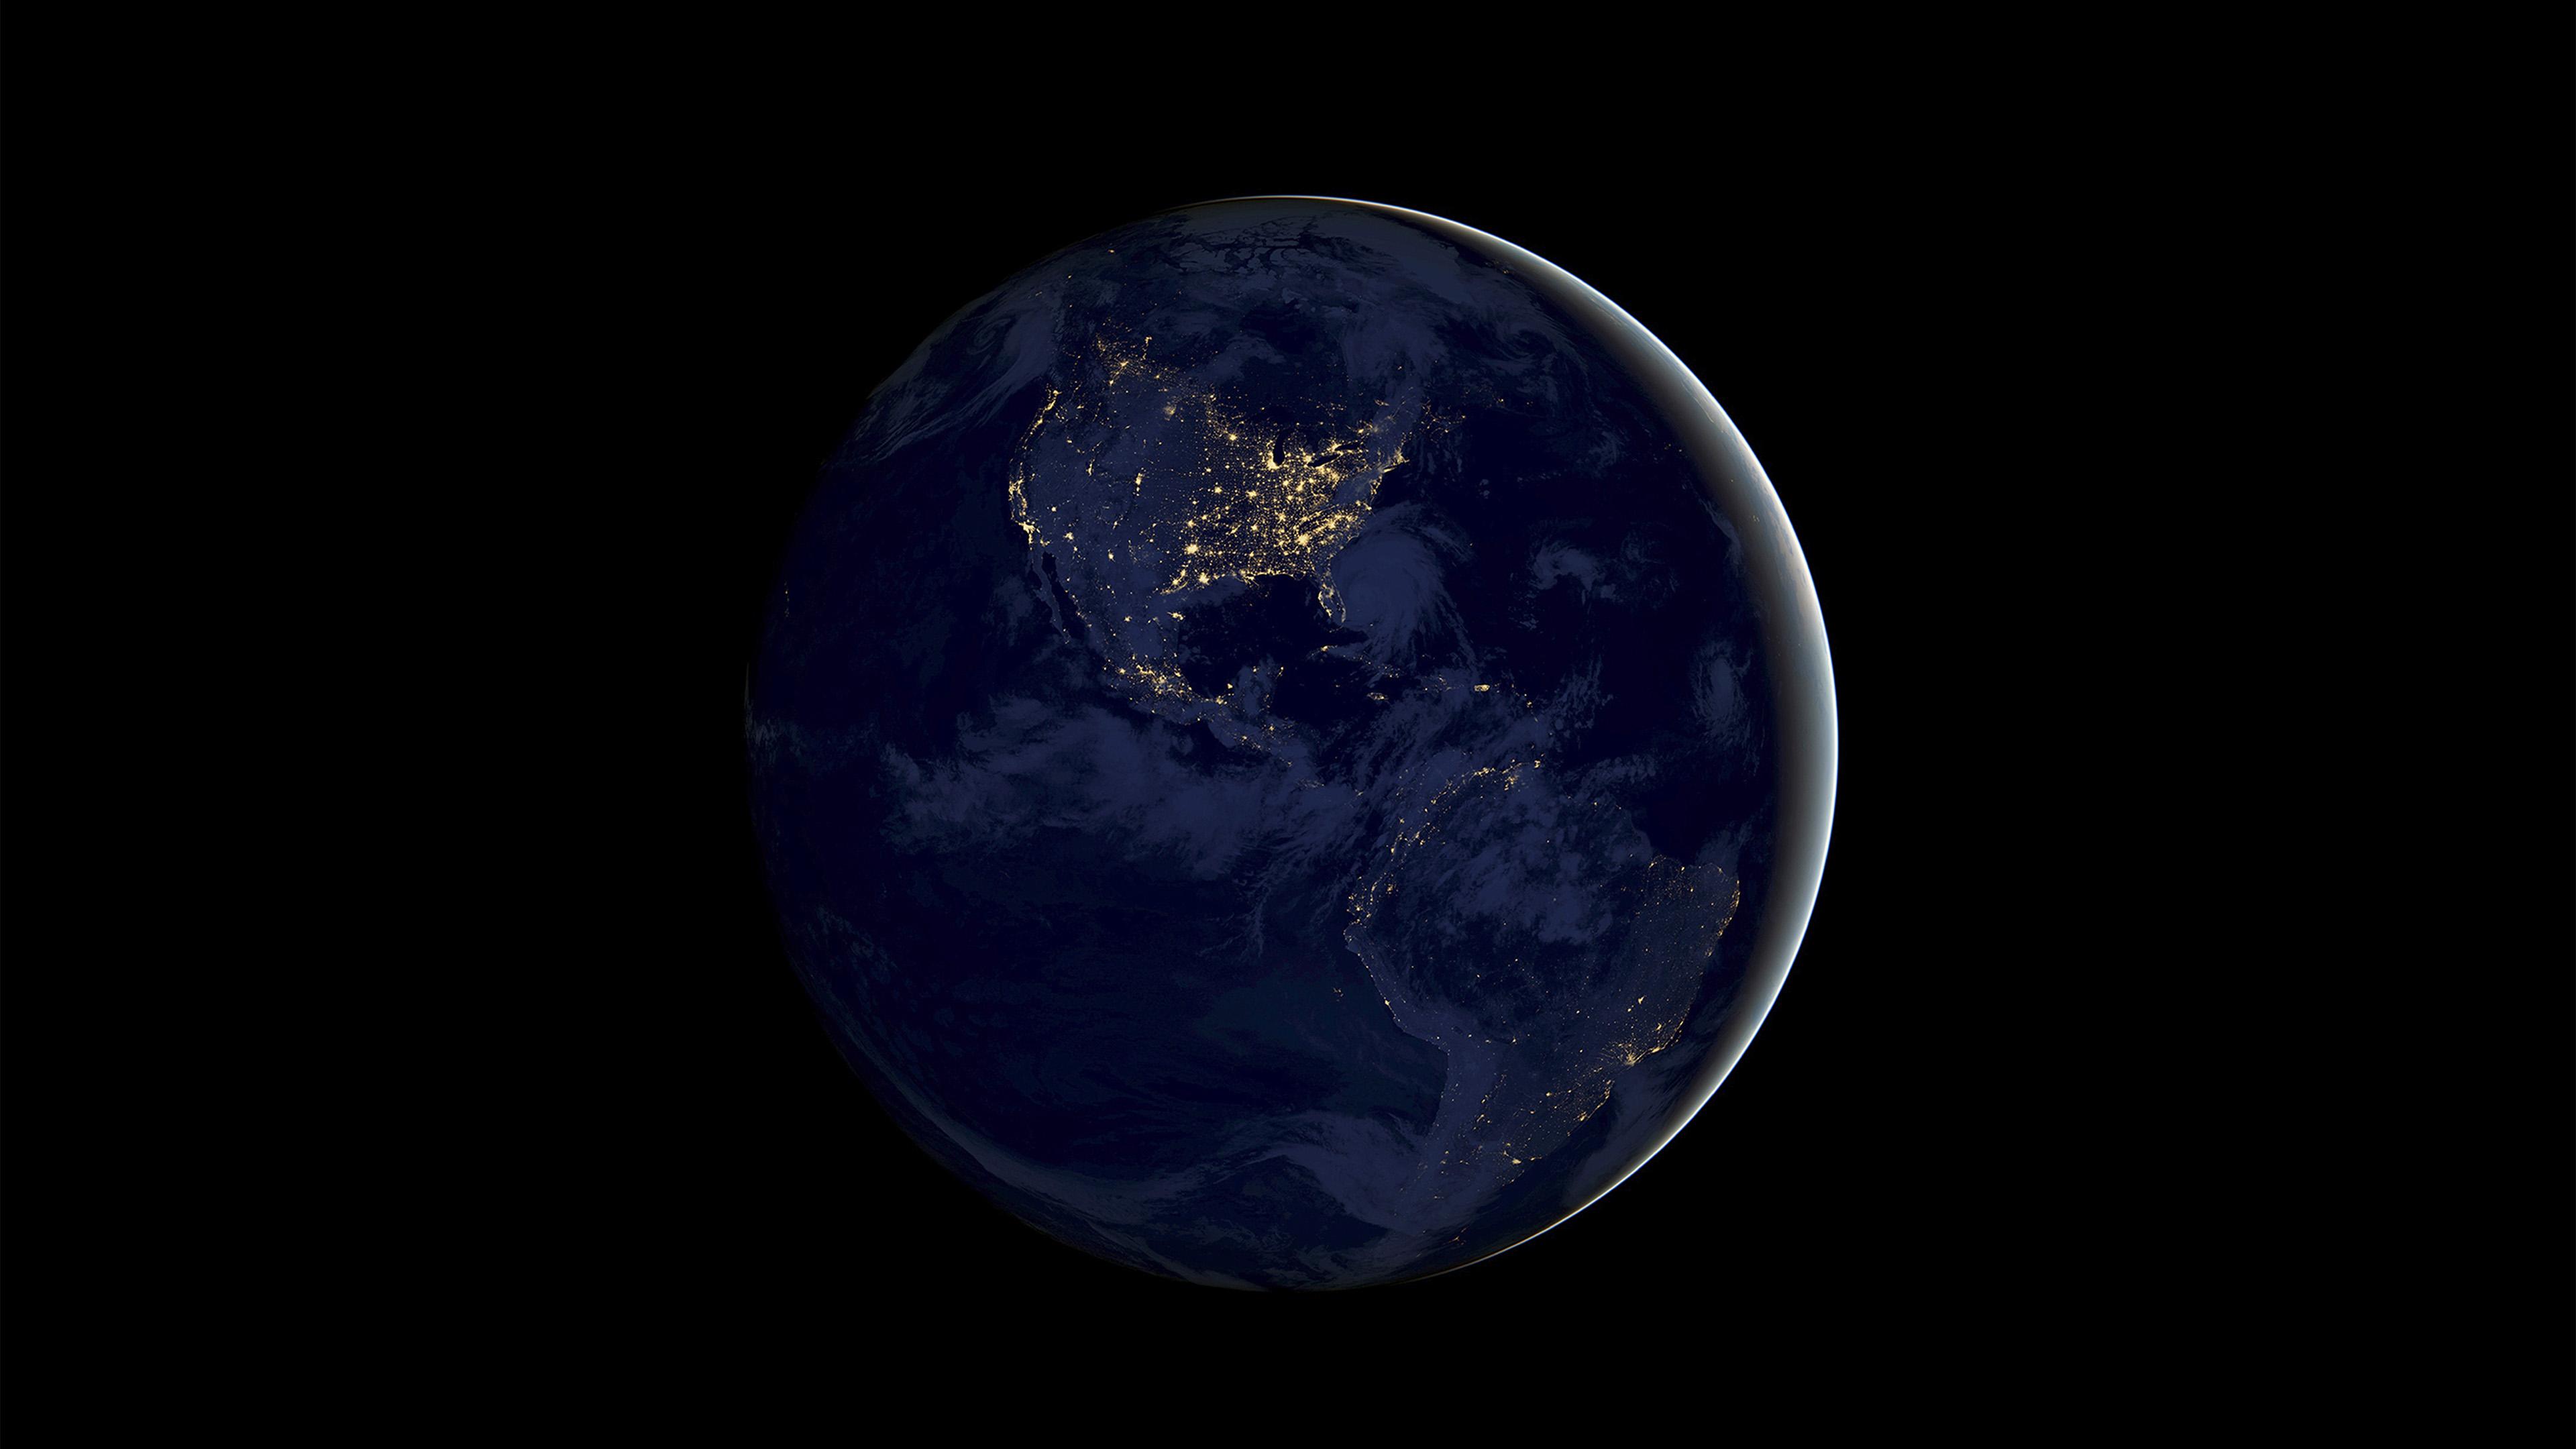 Fall Wallpaper For Macbook Pro Bd20 Earth Space Dark Night Art Illustration Wallpaper